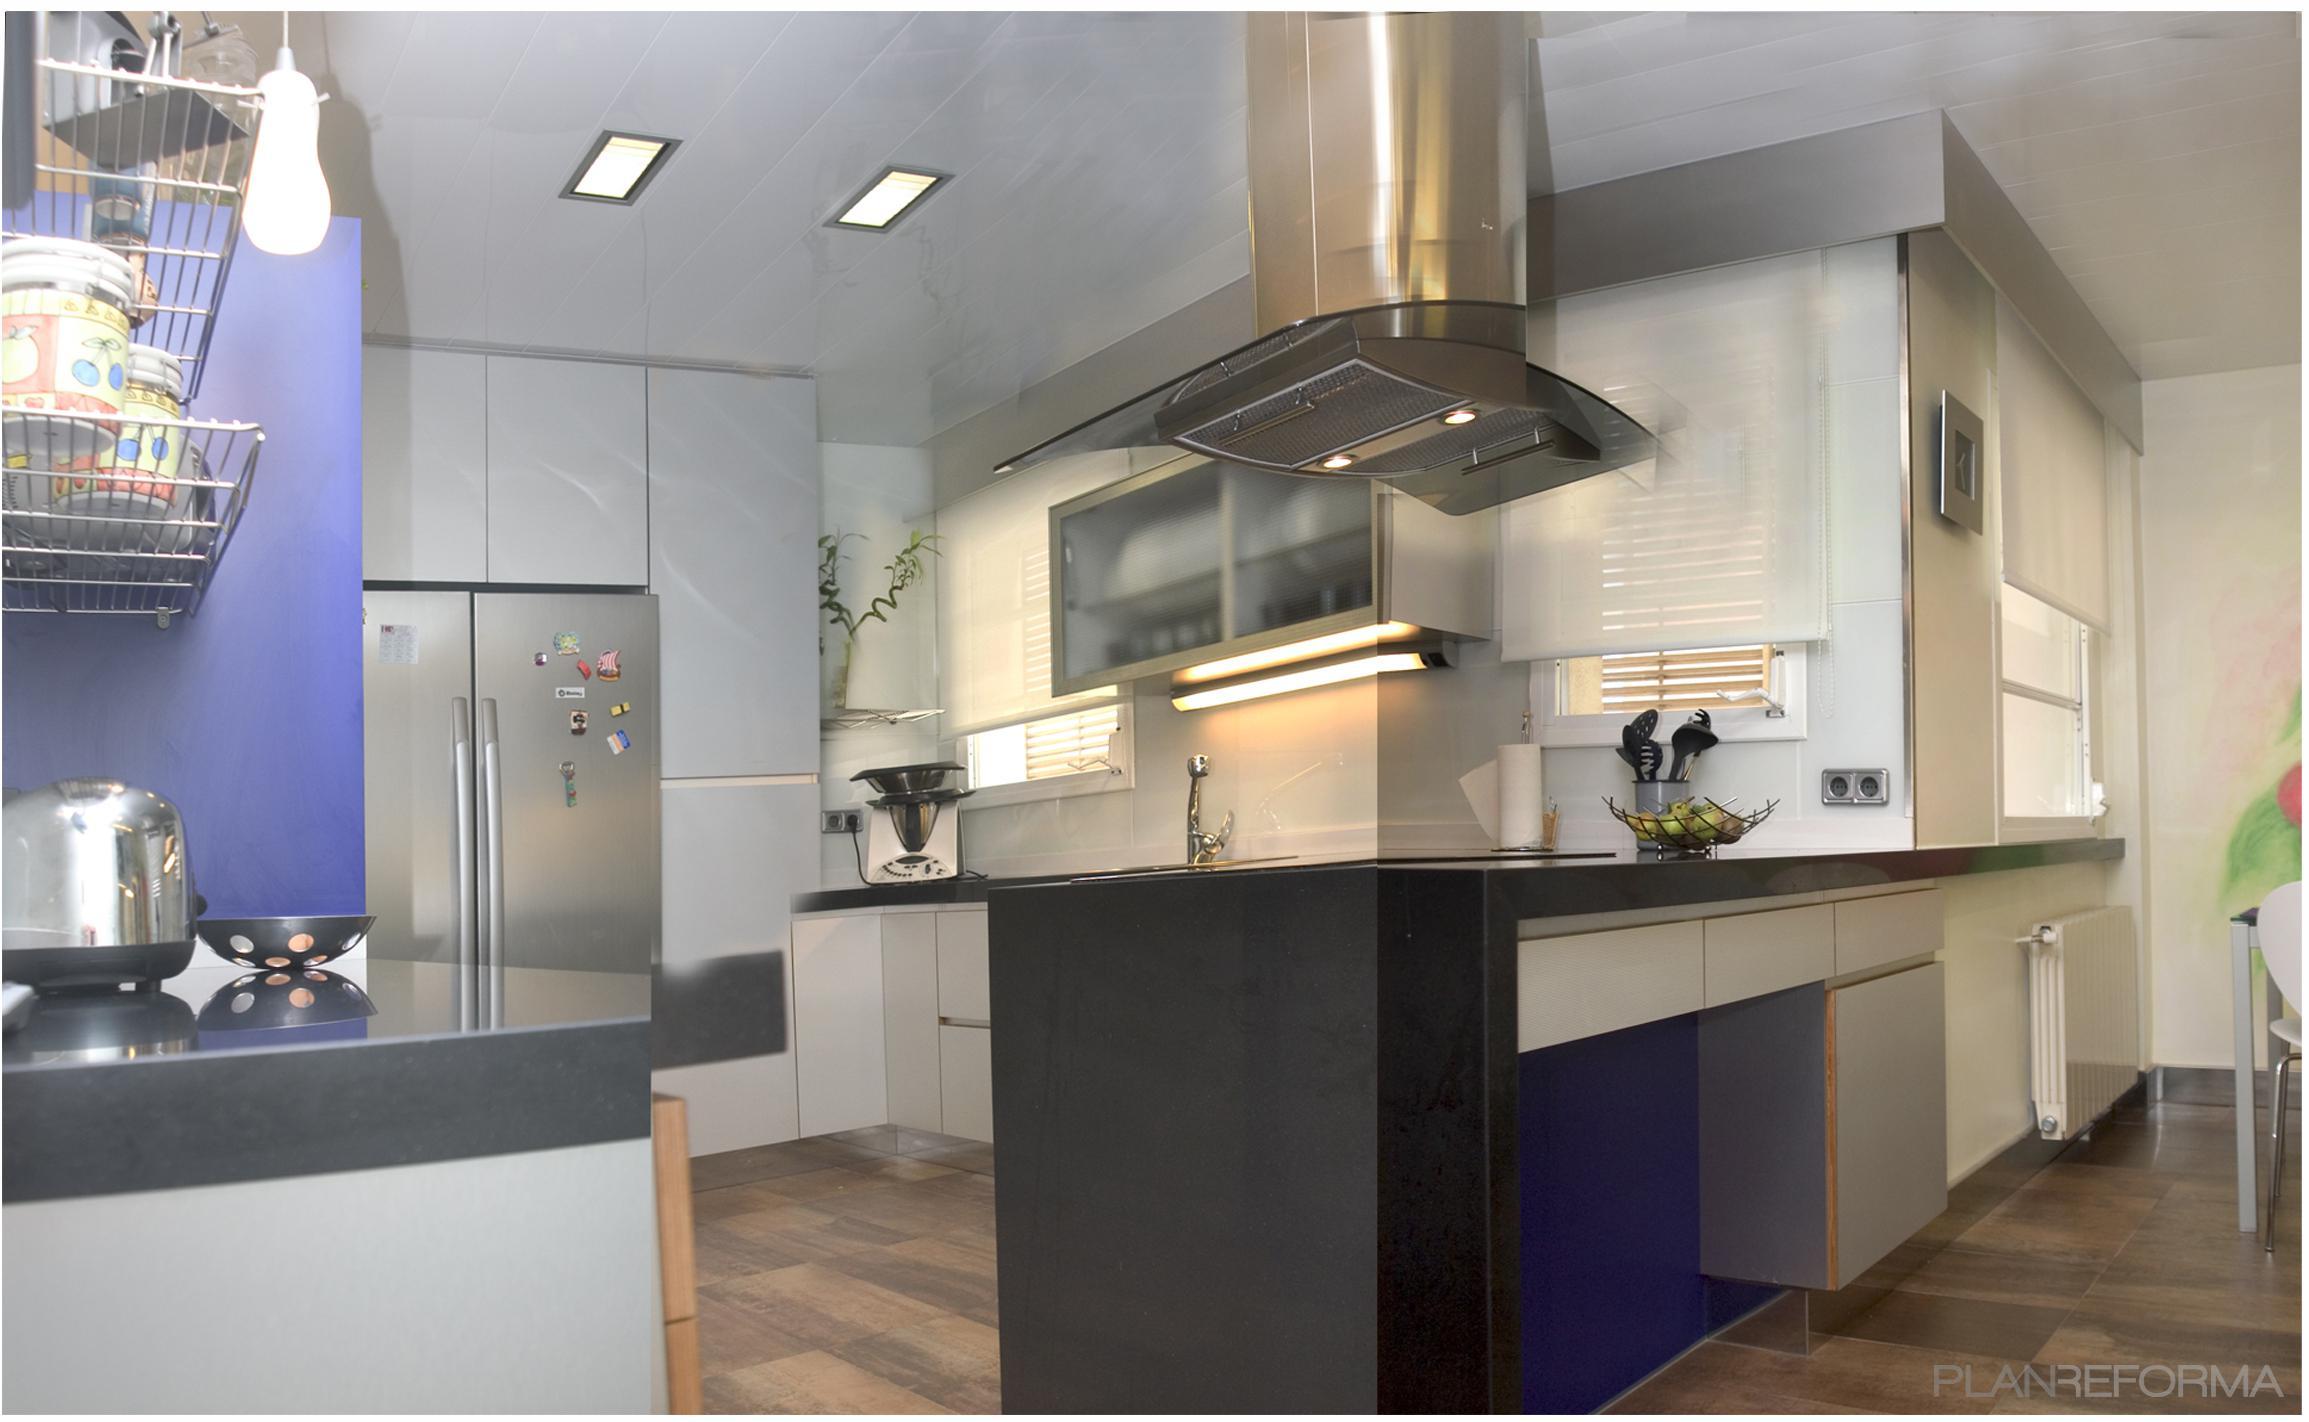 Cocina, Cafeteria Estilo contemporaneo Color azul oscuro, blanco, gris